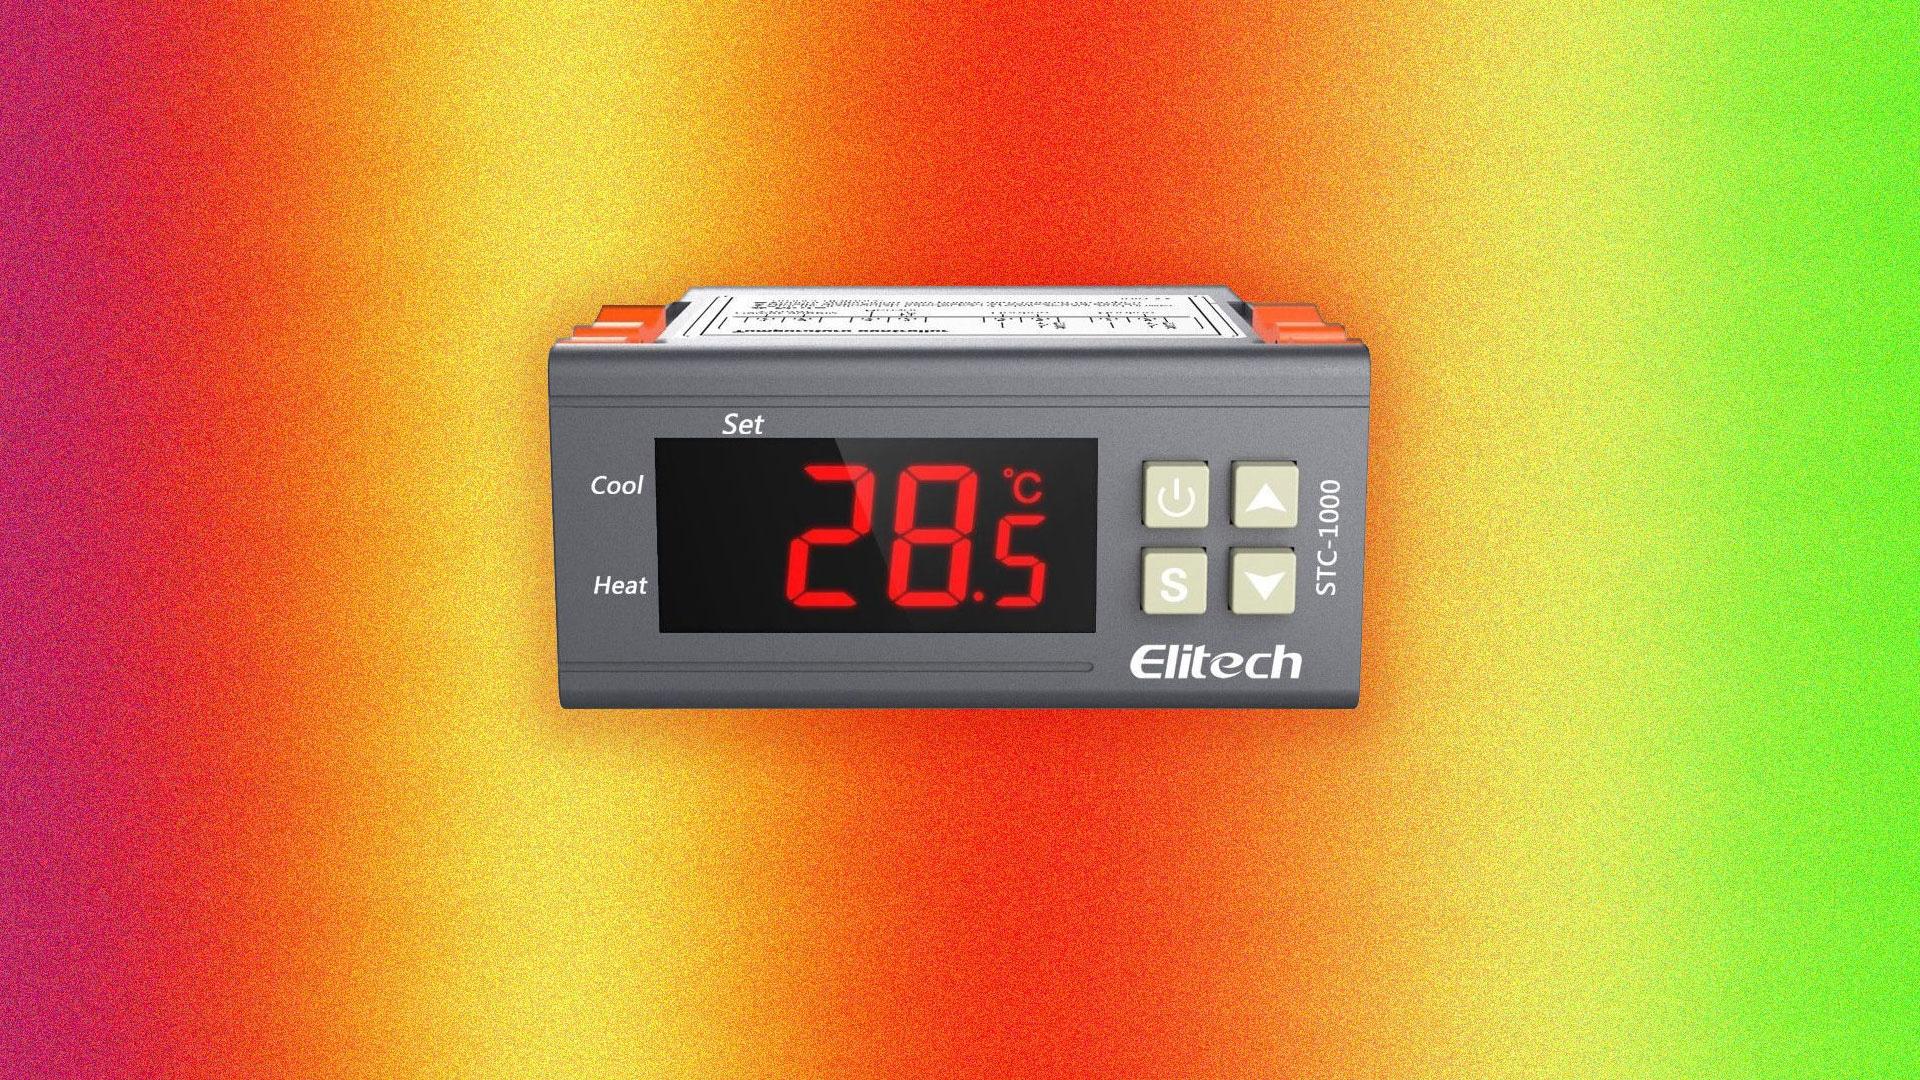 2 le cinghie di trasmissione per adattarsi Hoover Vision Reach VR81VR02001 Cintura First Class Post